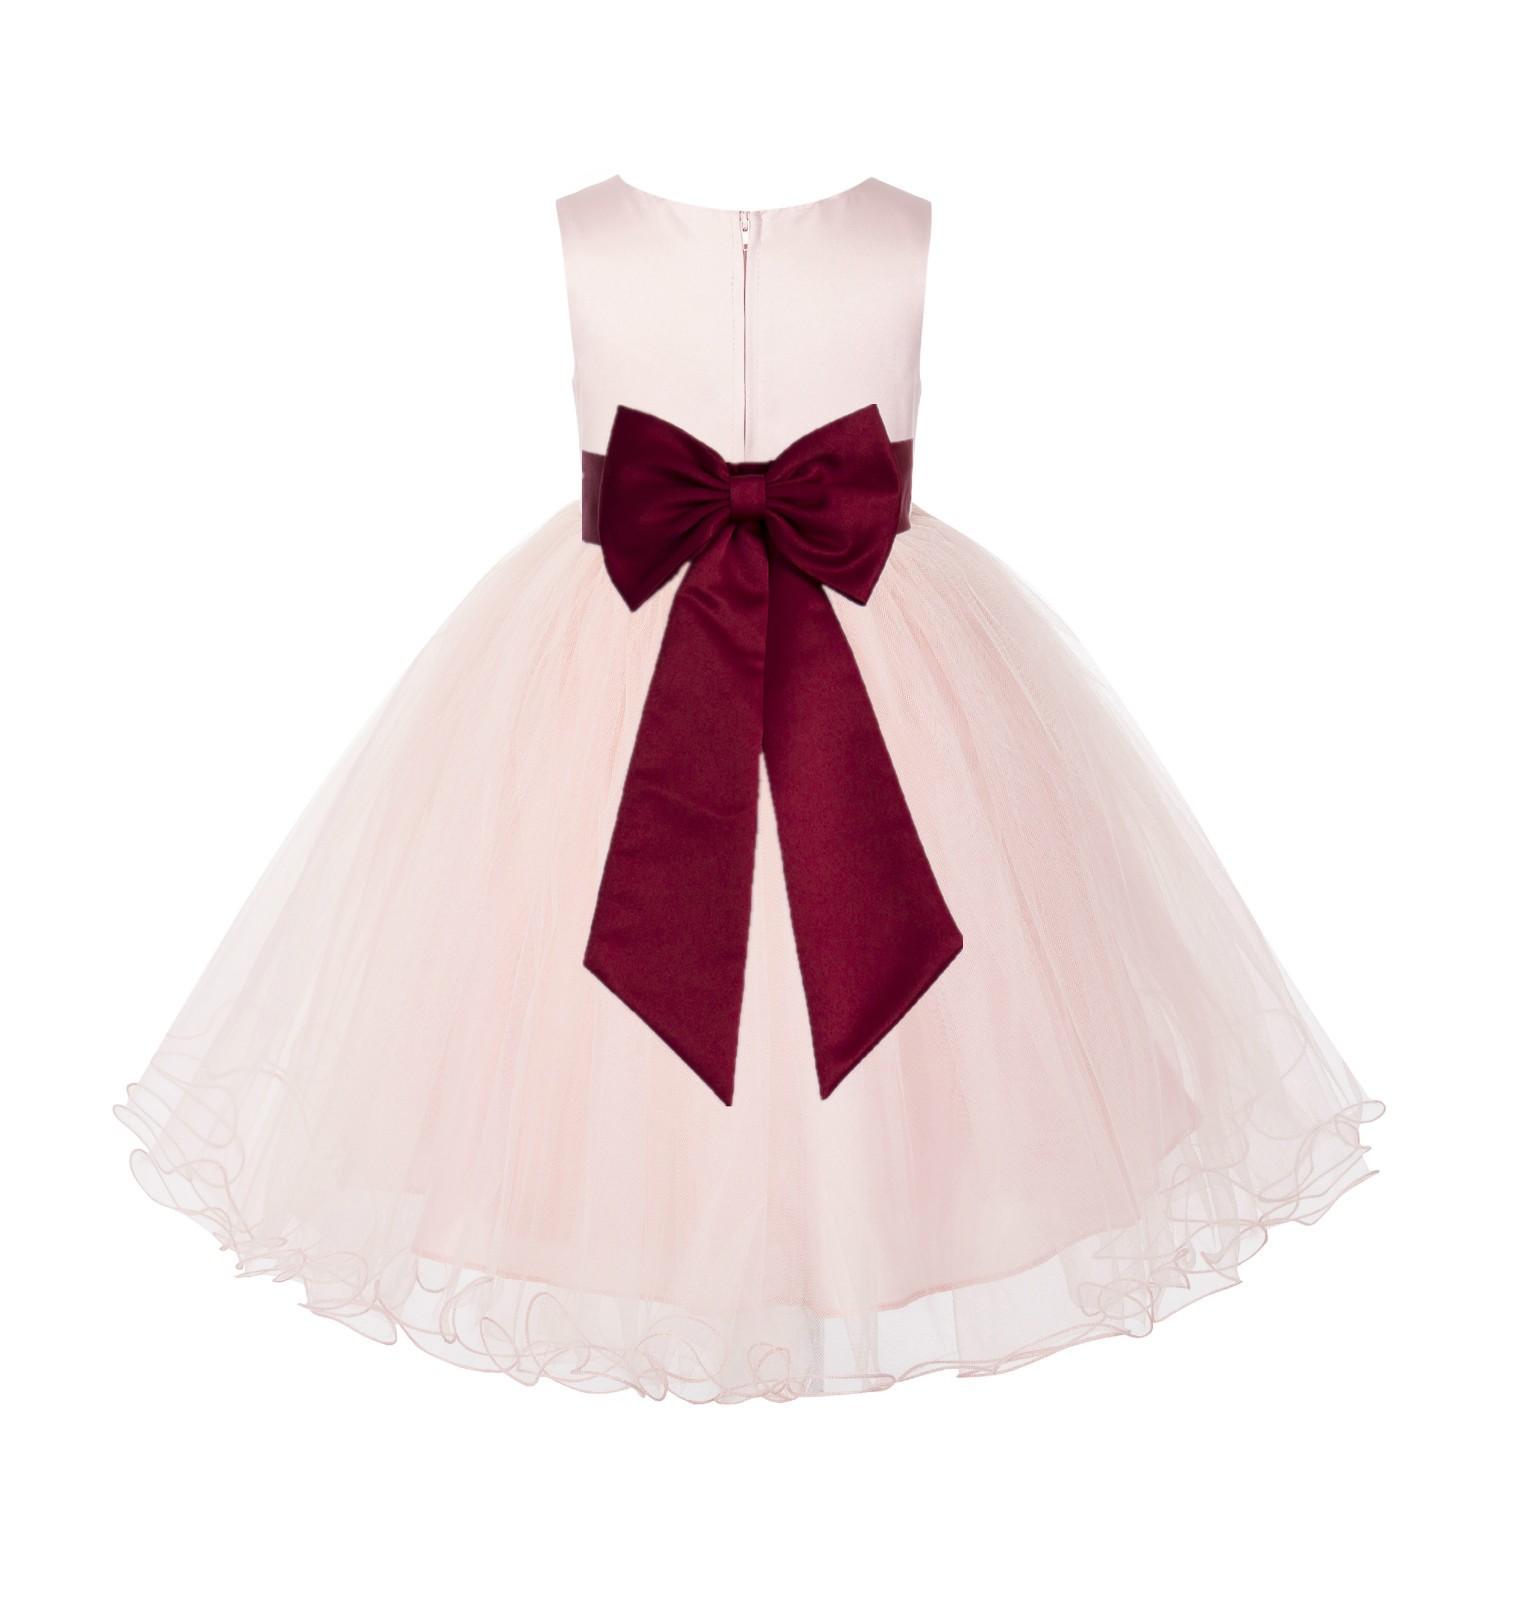 Blush PInk / Apple Tulle Rattail Edge Flower Girl Dress Wedding Bridesmaid 829T